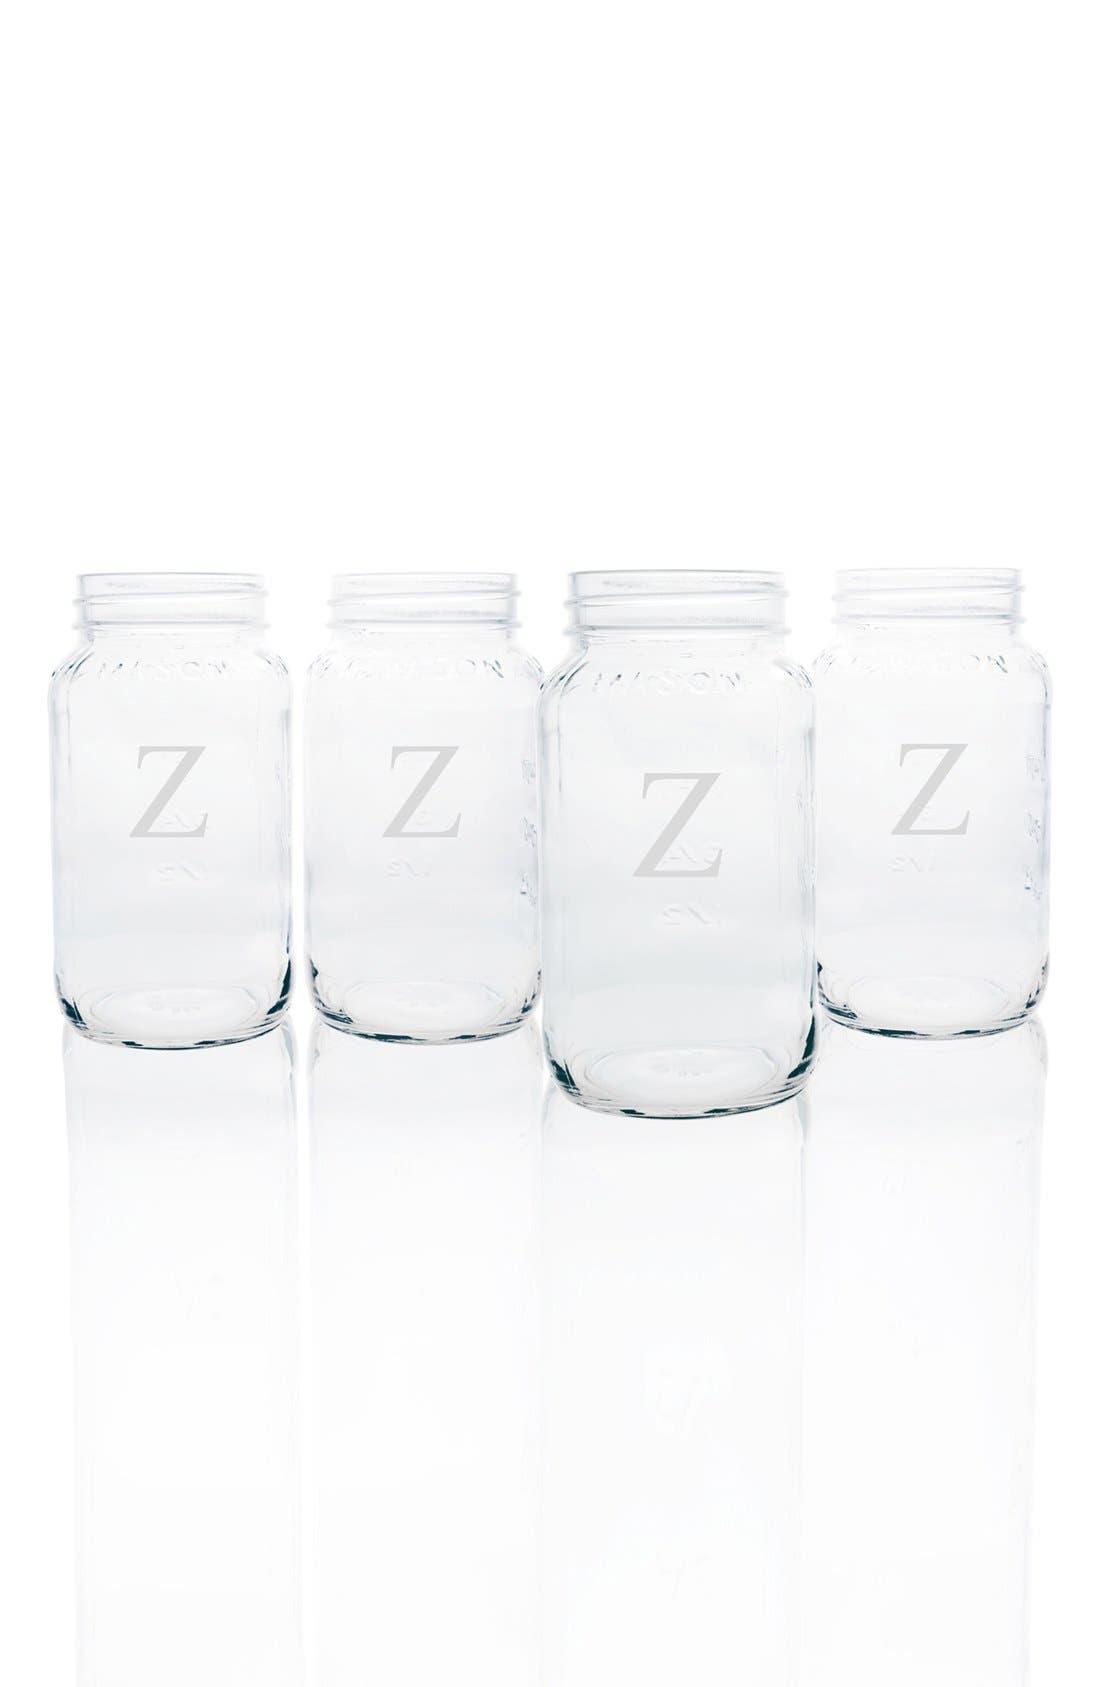 Main Image - Cathy's Concepts Monogram Glass Mason Jar Mugs (Set of 4)